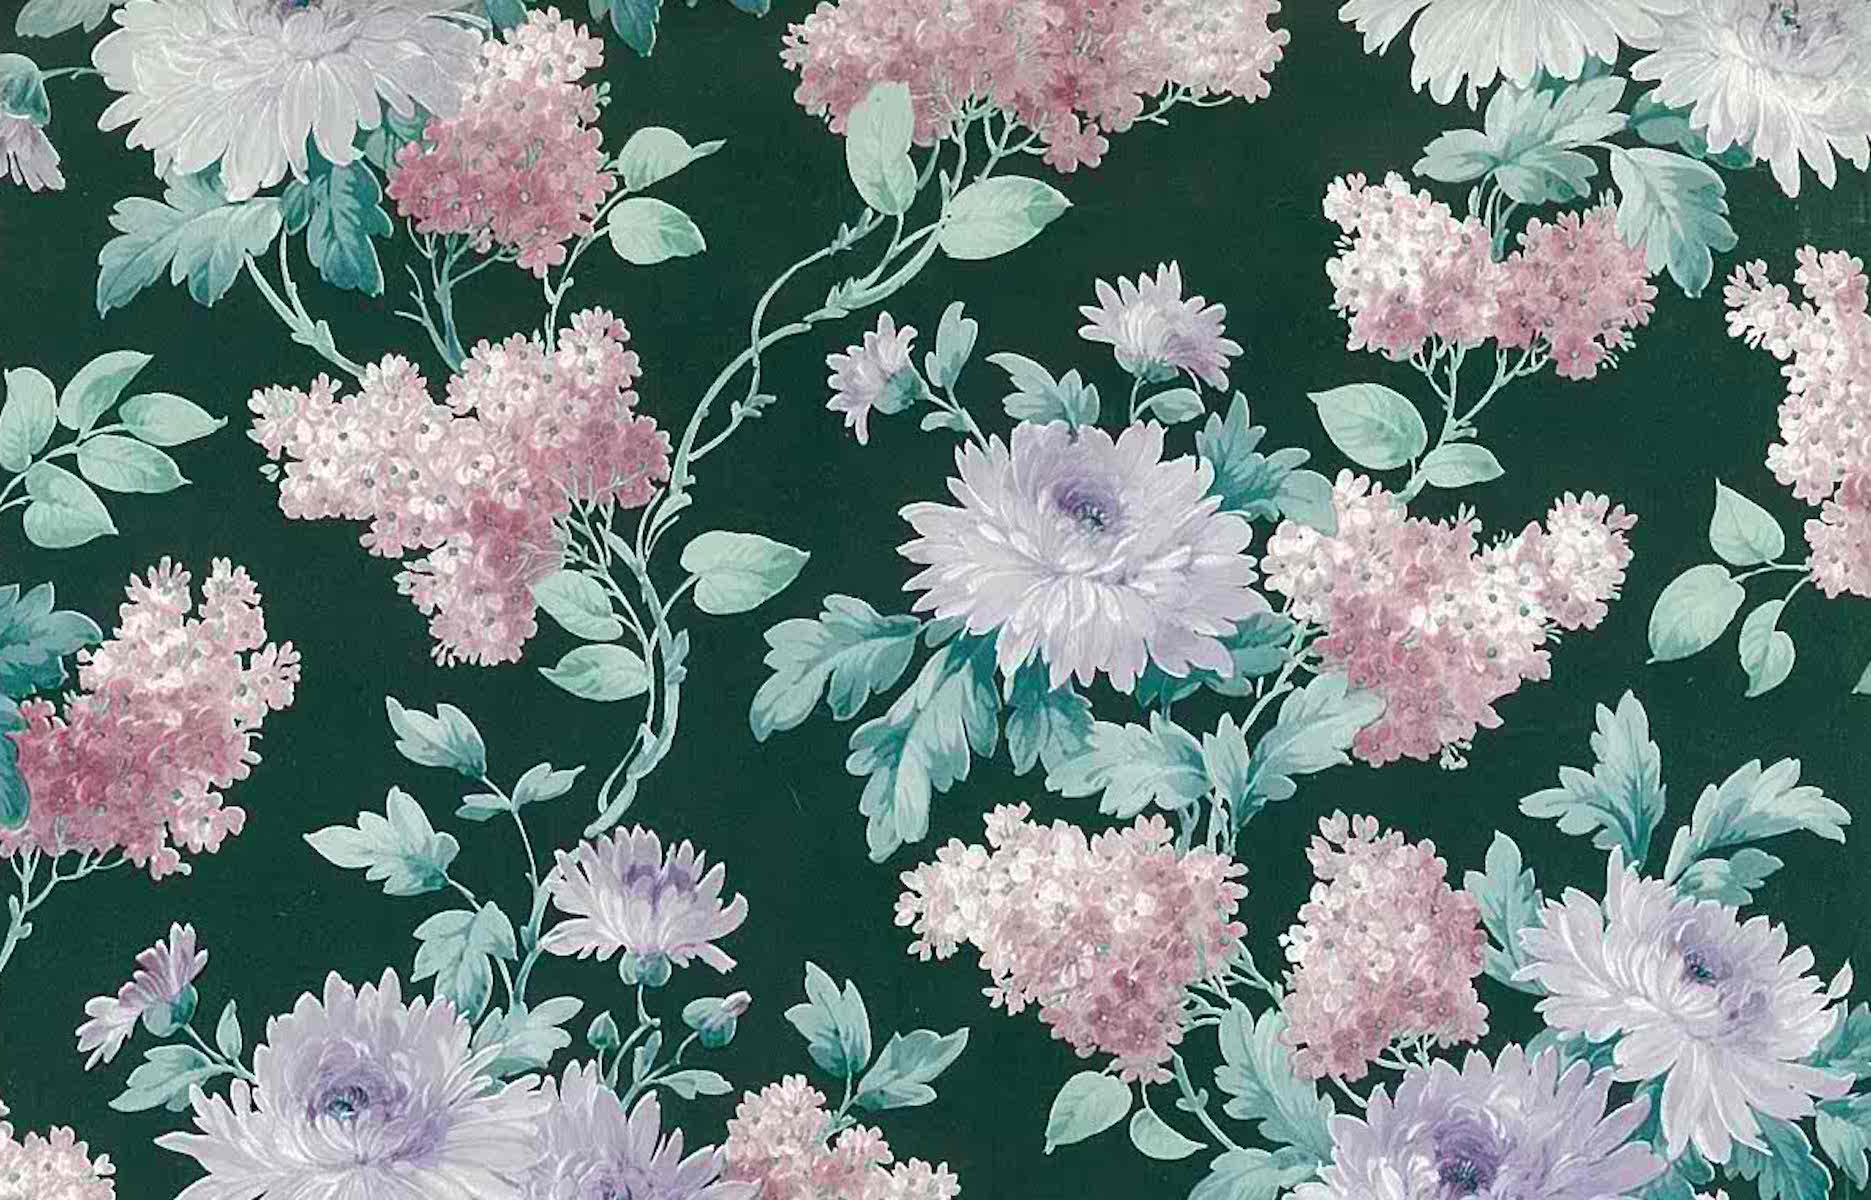 Green Floral Vintage Wallpaper Pink White Purple Lilacs